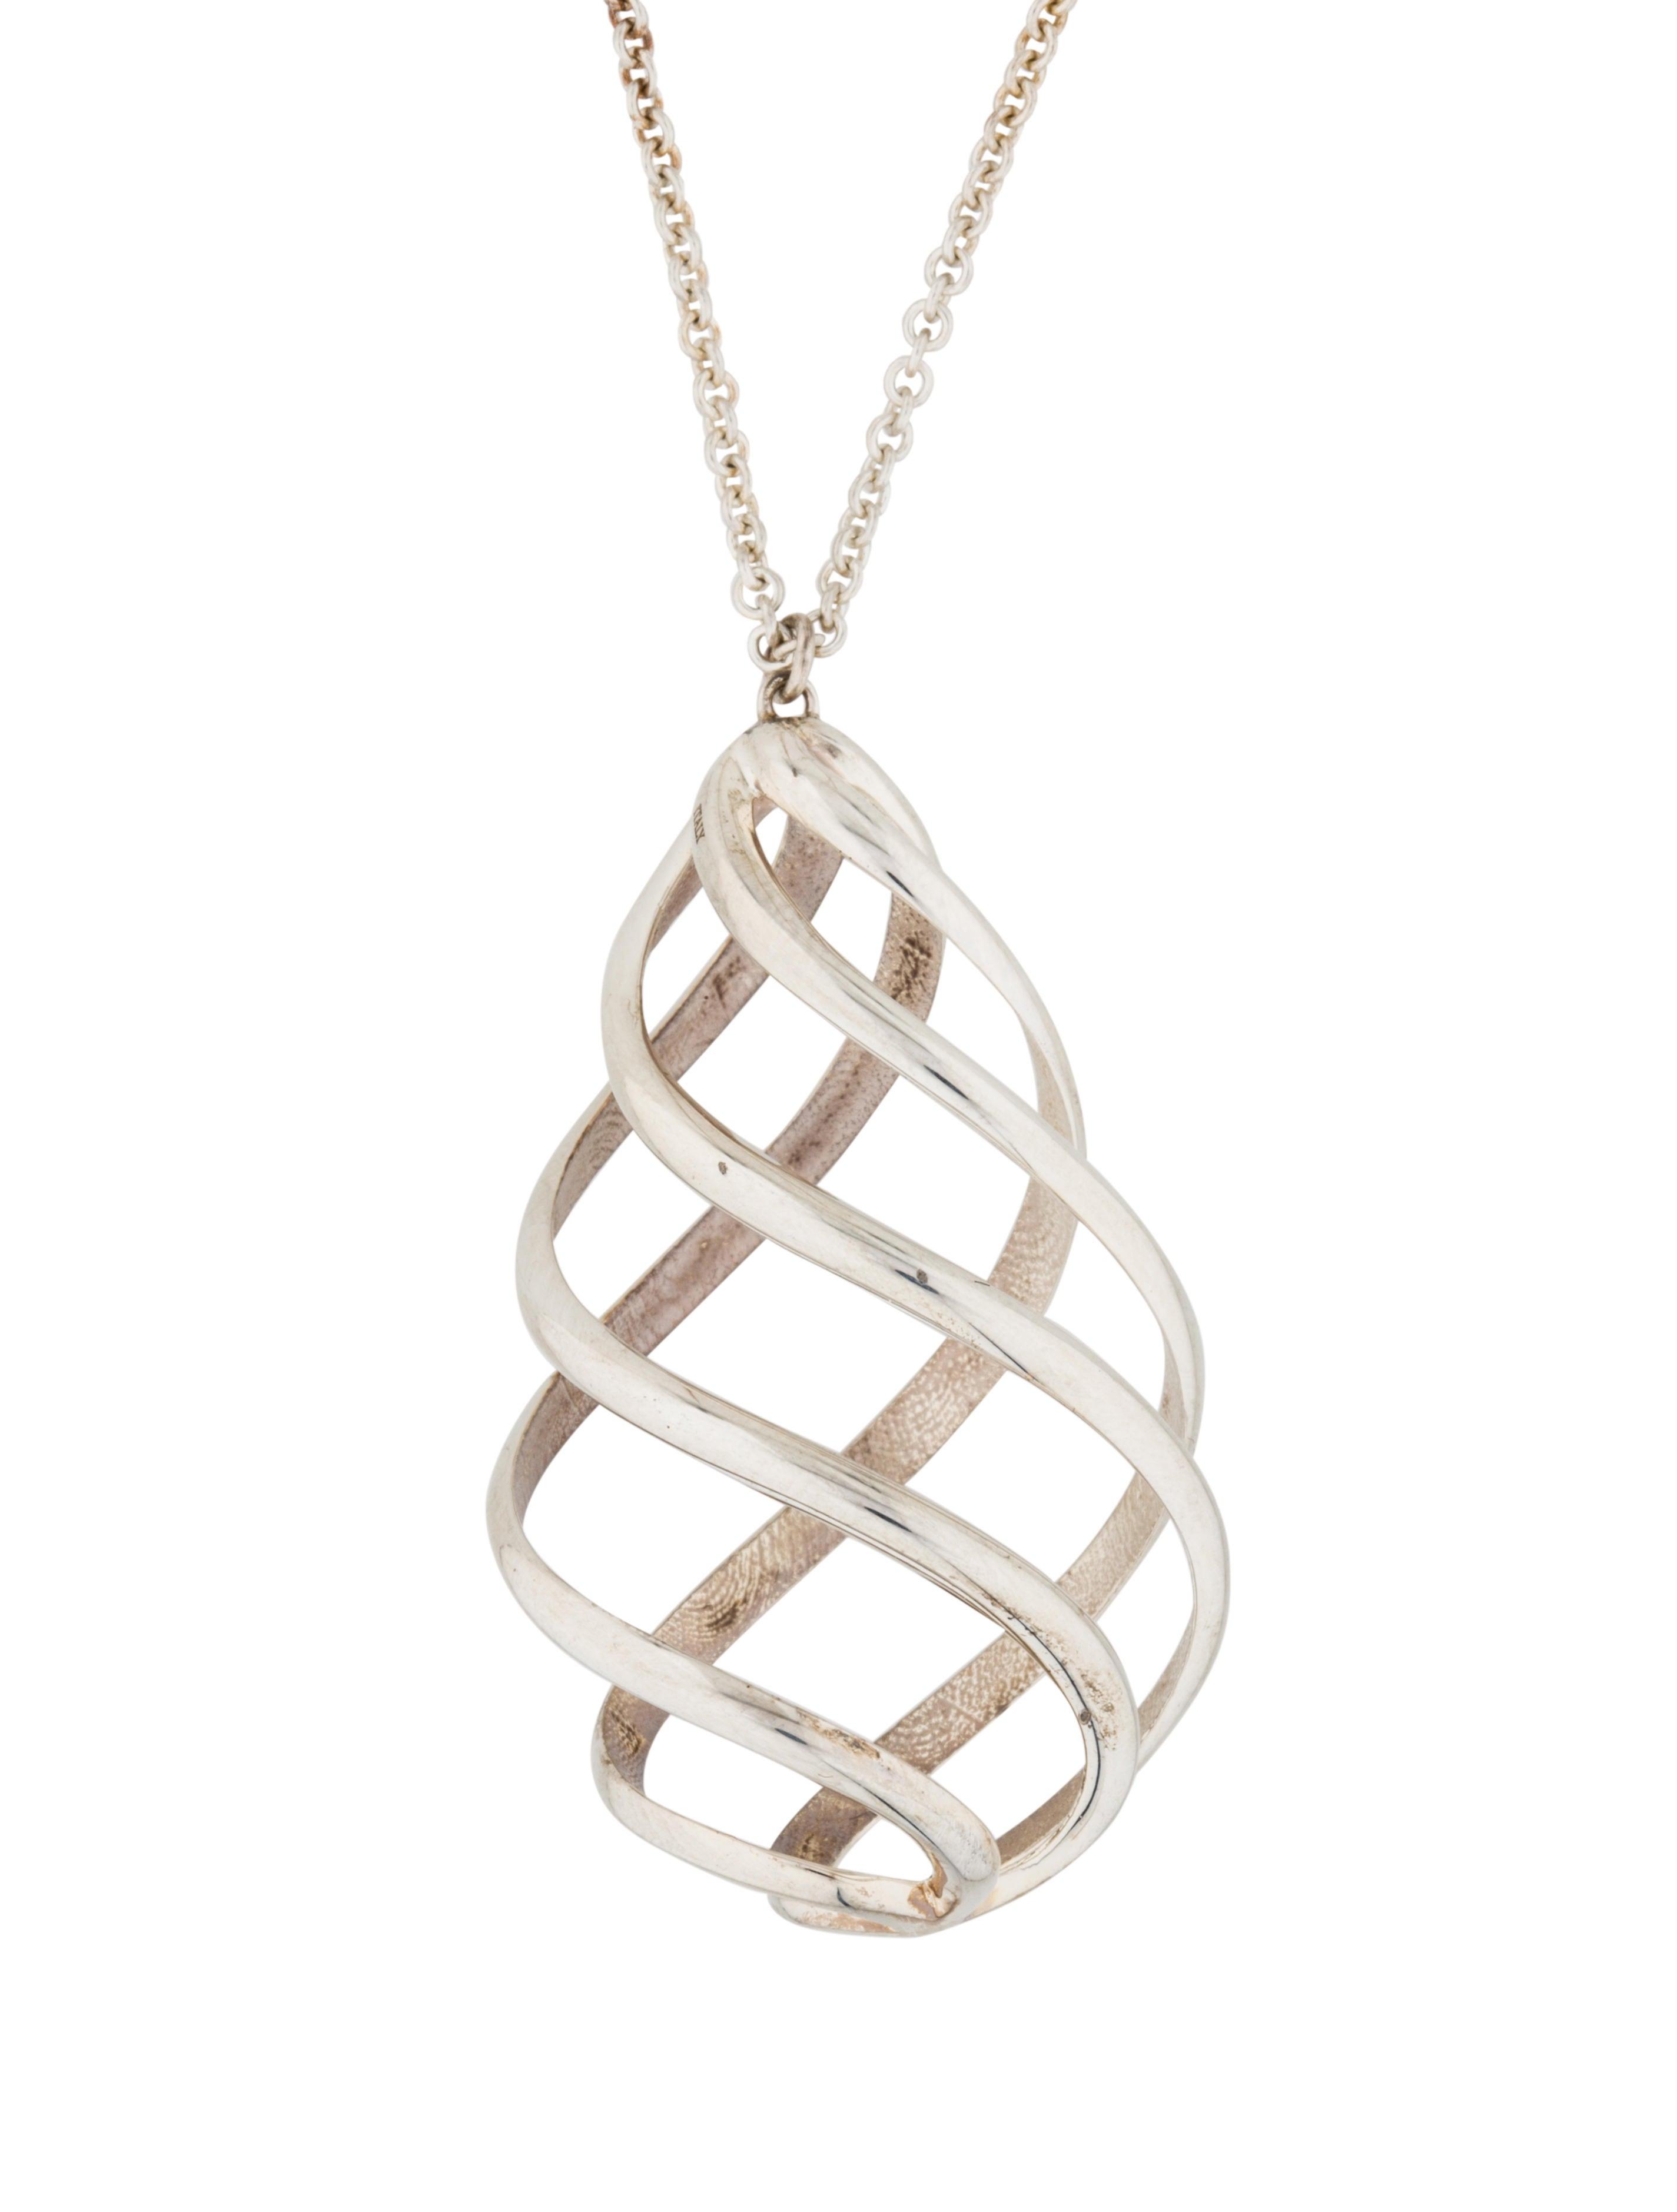 da325128a Tiffany & Co. Paloma's Venezia Luce Pendant Necklace - Necklaces ...